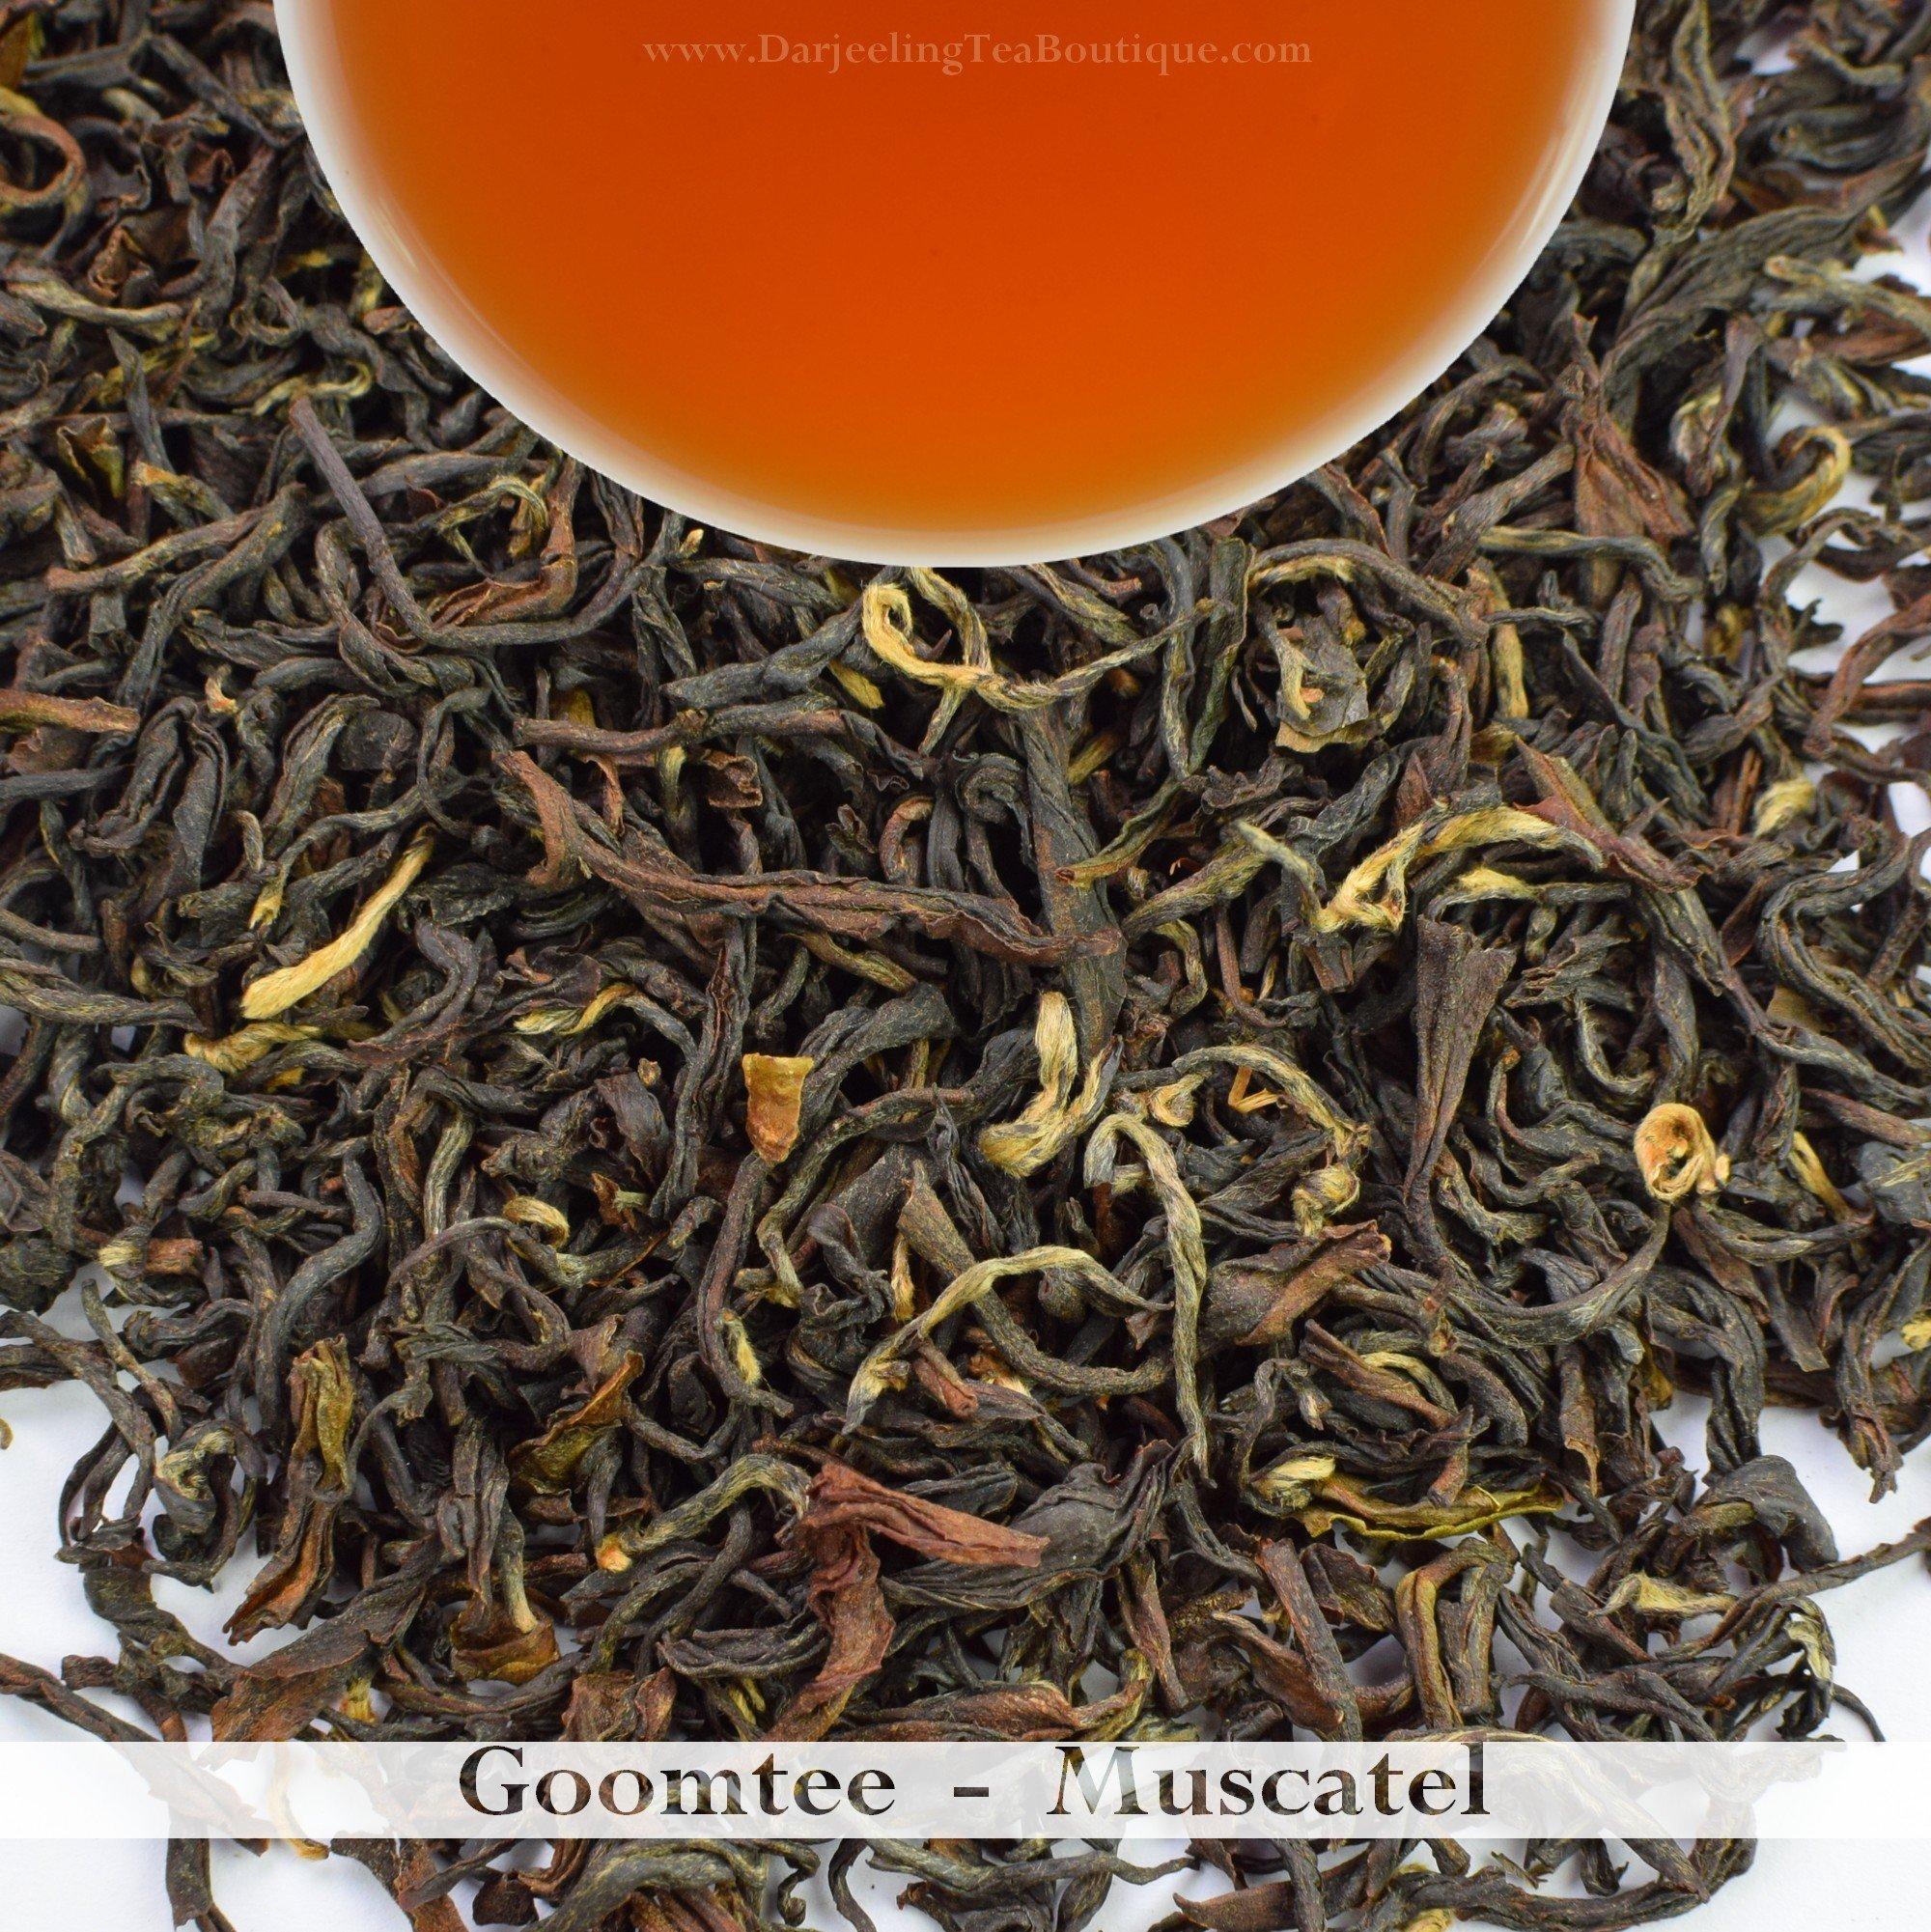 Bulk Wholesale Pack - 2017 Darjeeling Second Flush Tea | Goomtee | 500gm (17.63oz) | Muscatel Flavor, Complex Tastes | Darjeeling Tea Boutique